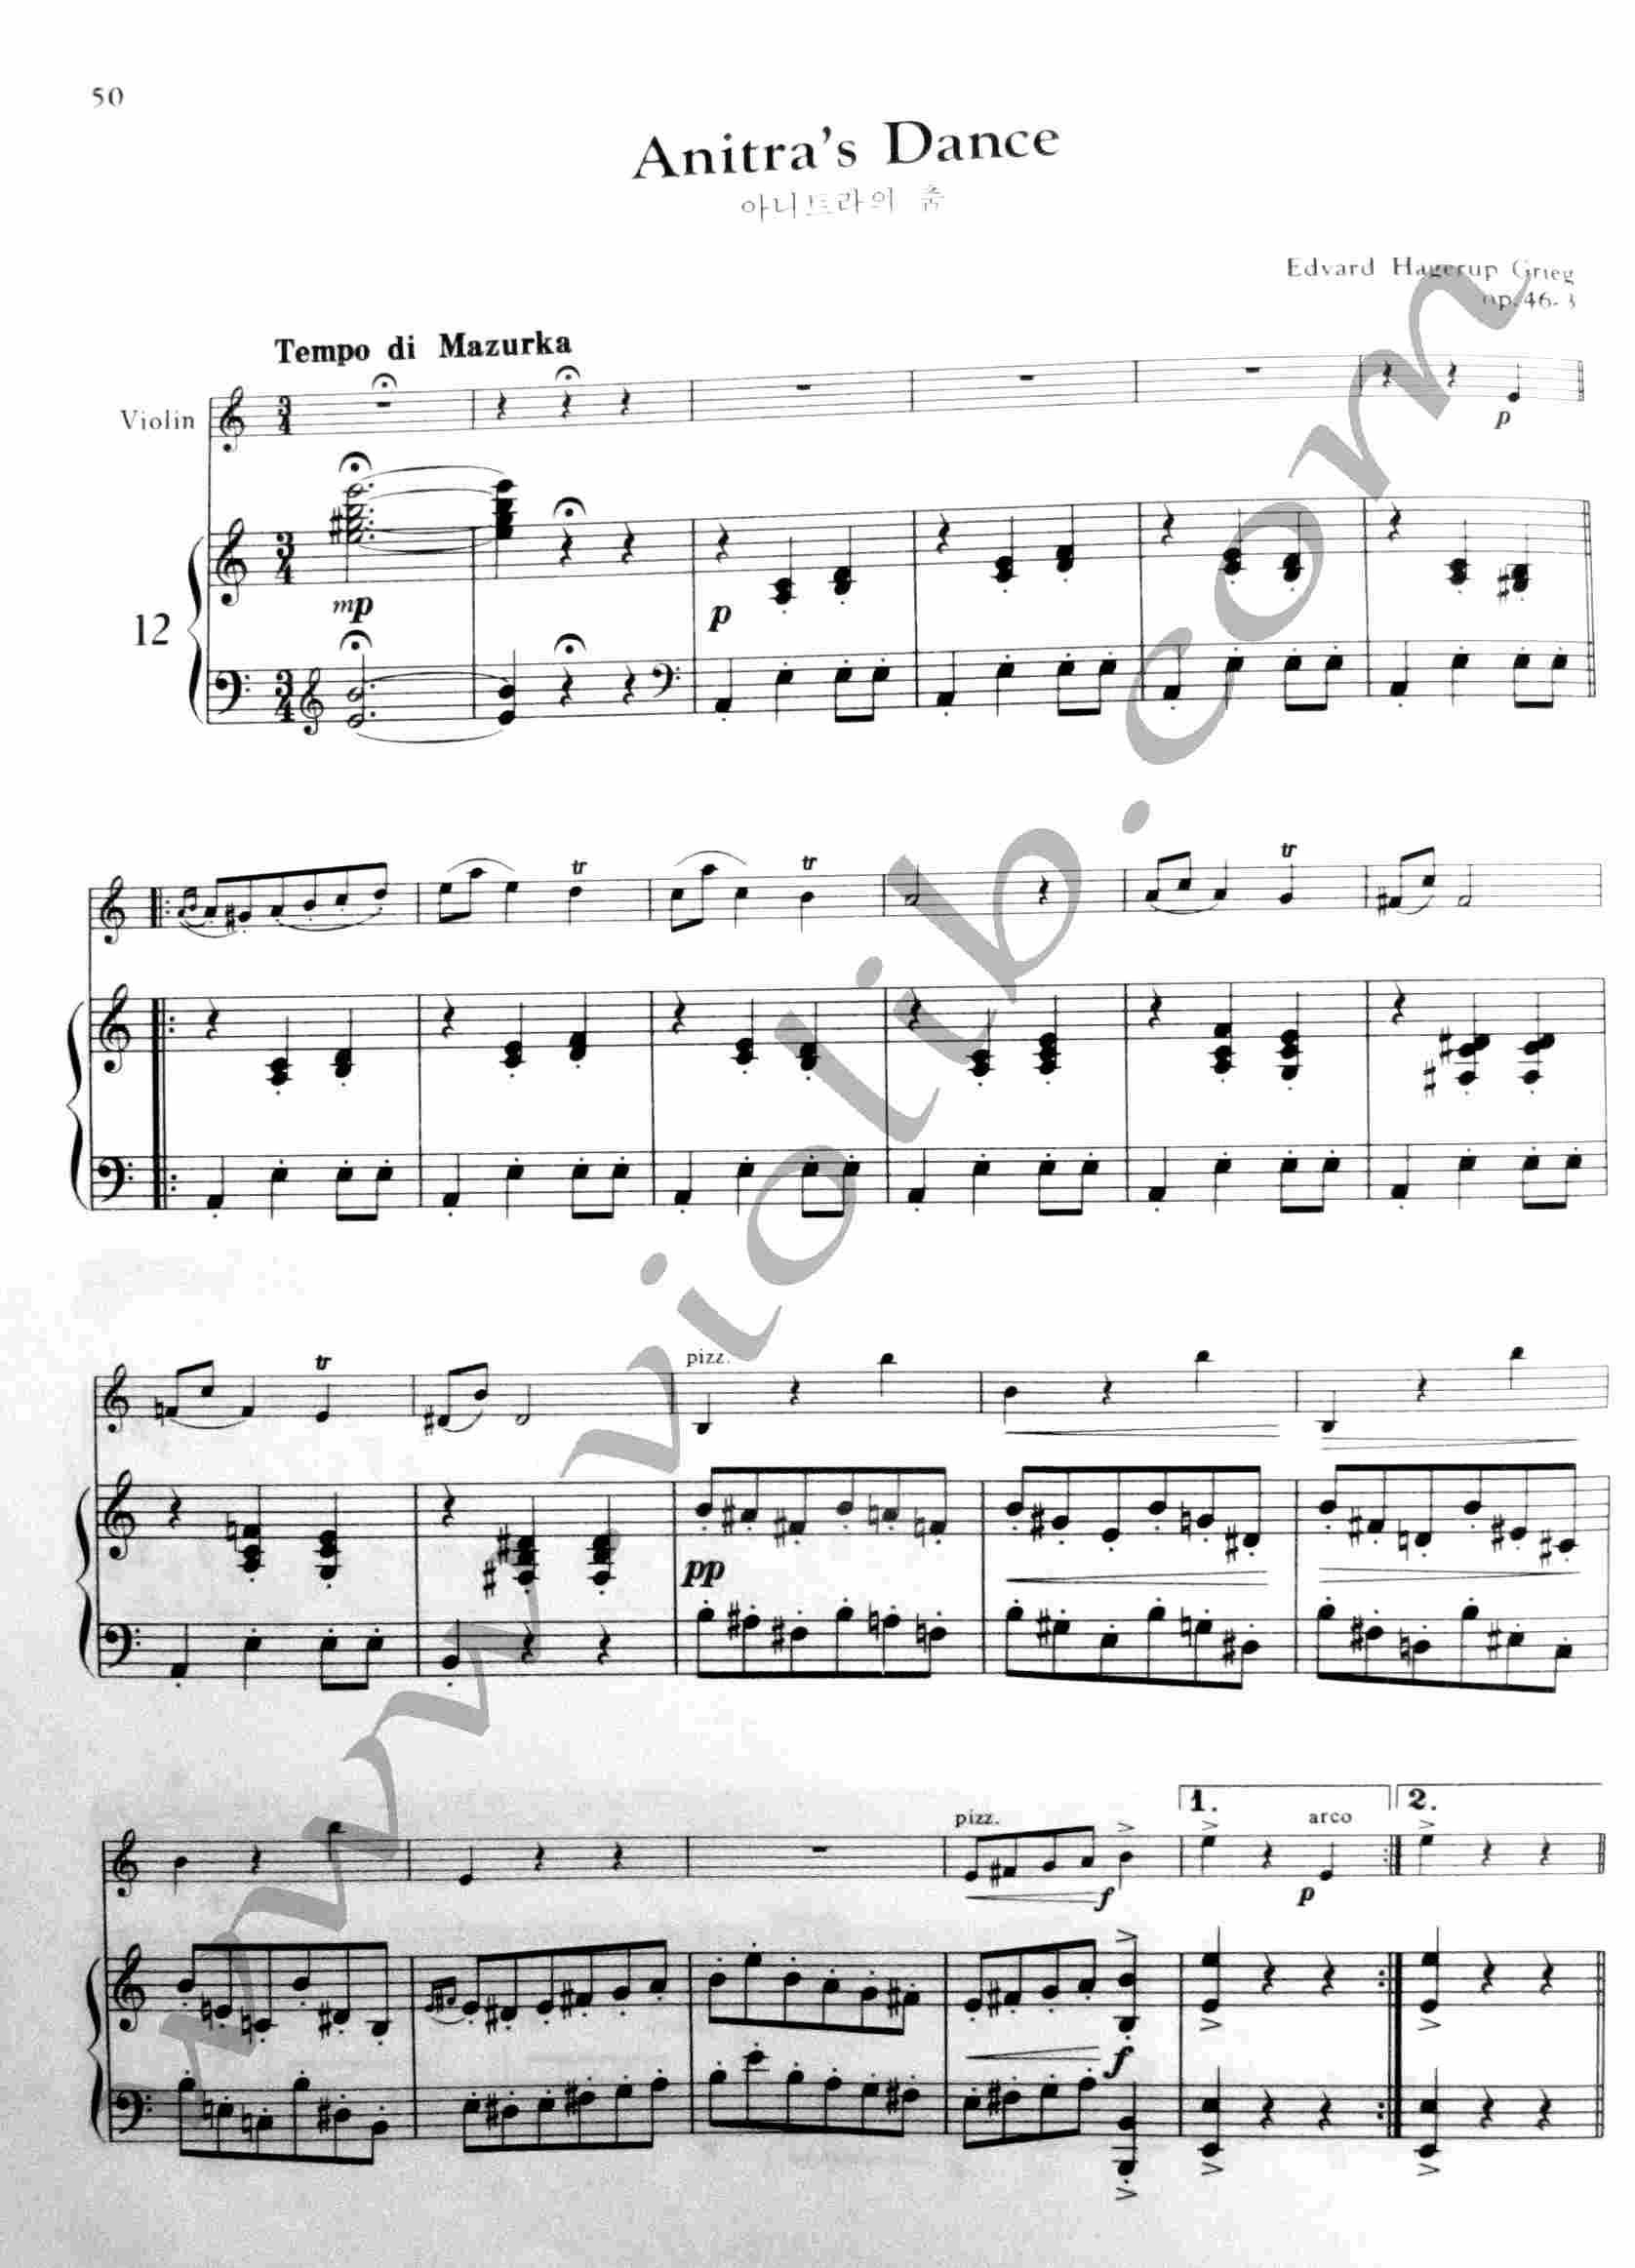 Kuchler concertino in g op11 vla / pf (1998) - купить книгу мягкий переплет композитор ferdinand kuchler фирма music